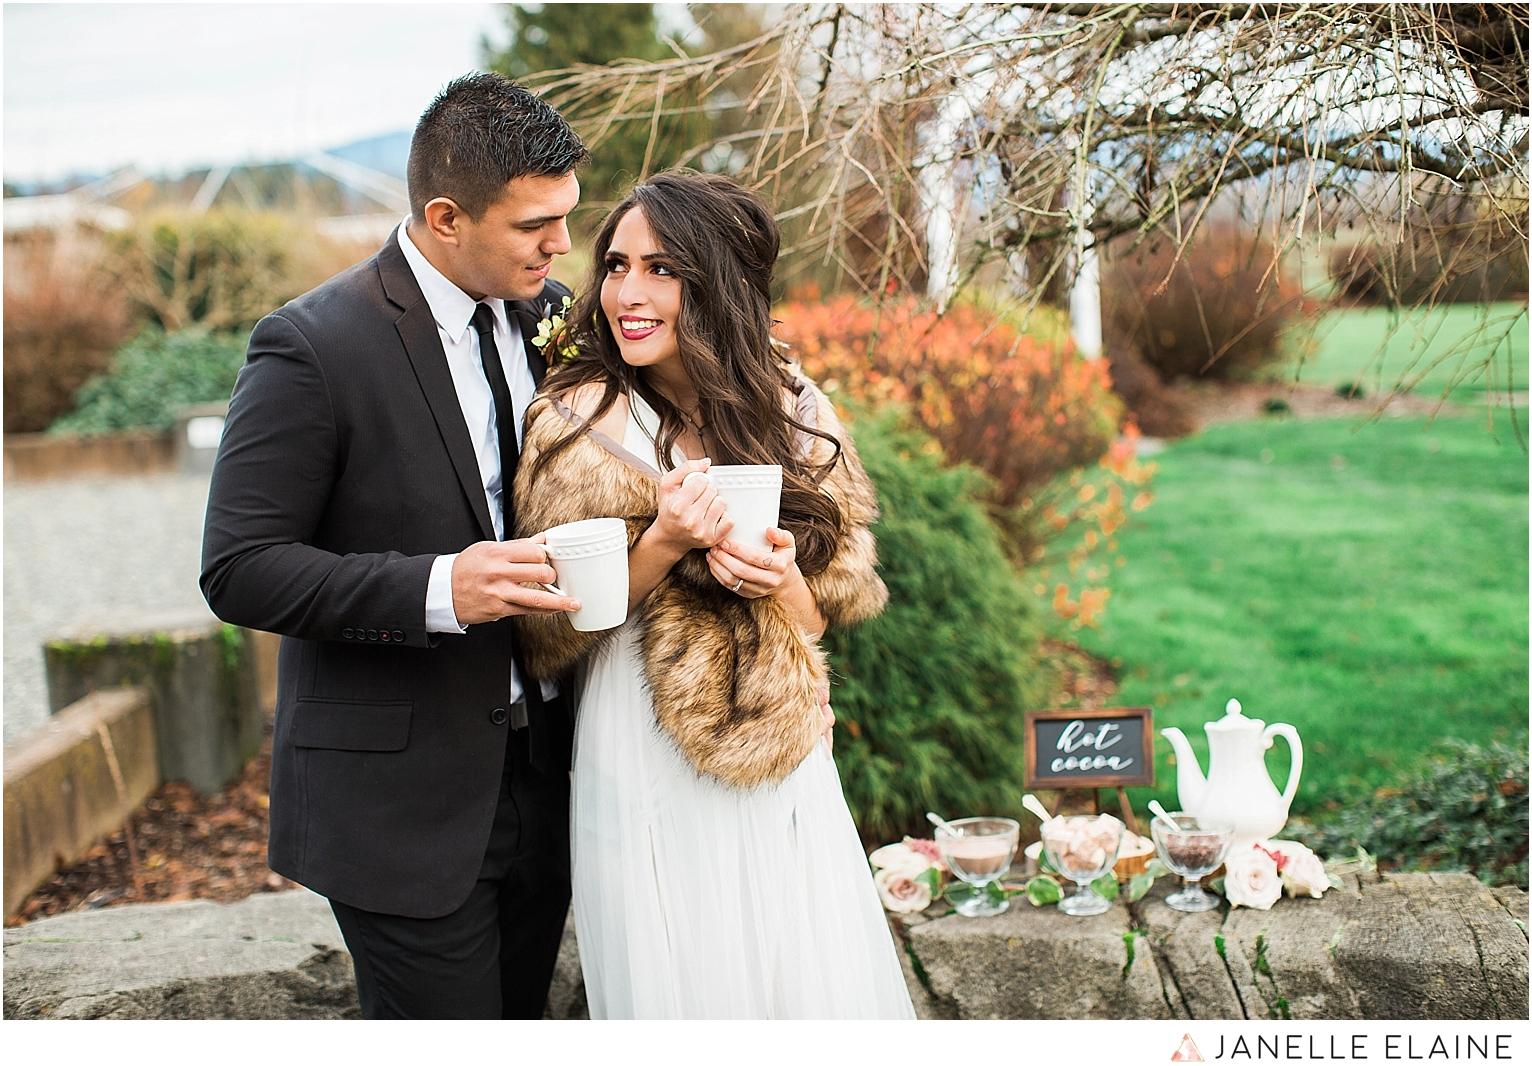 elopement-wedding-photographer-seattle washington-photographers-76.jpg